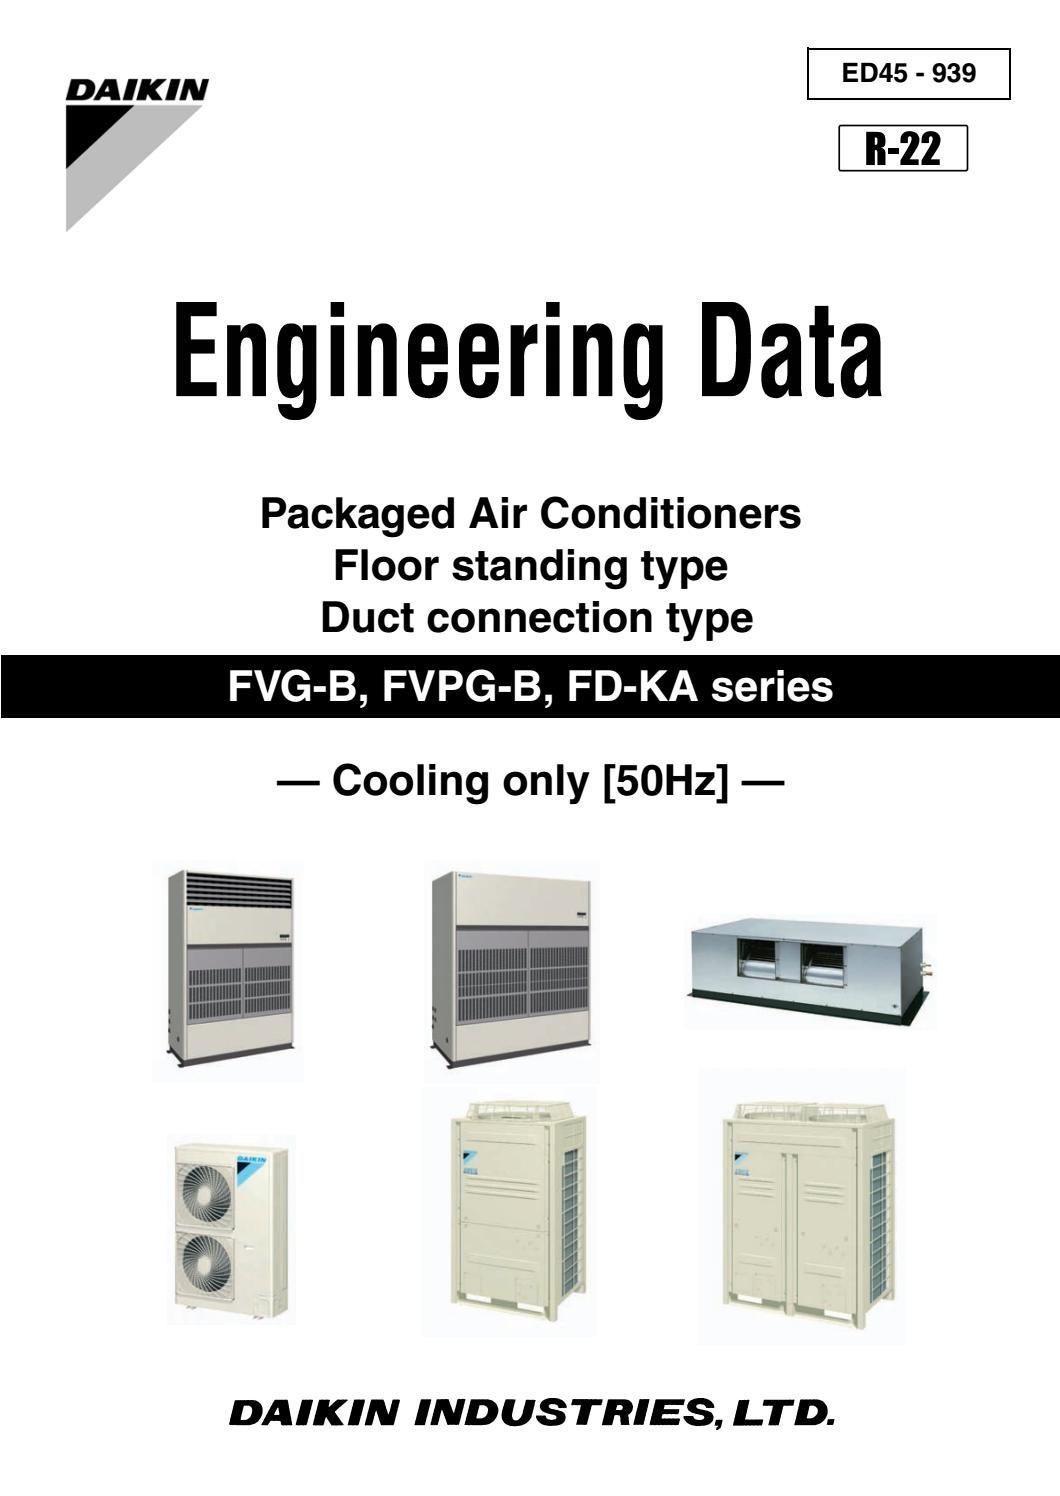 emailair air conditioner manual ebook